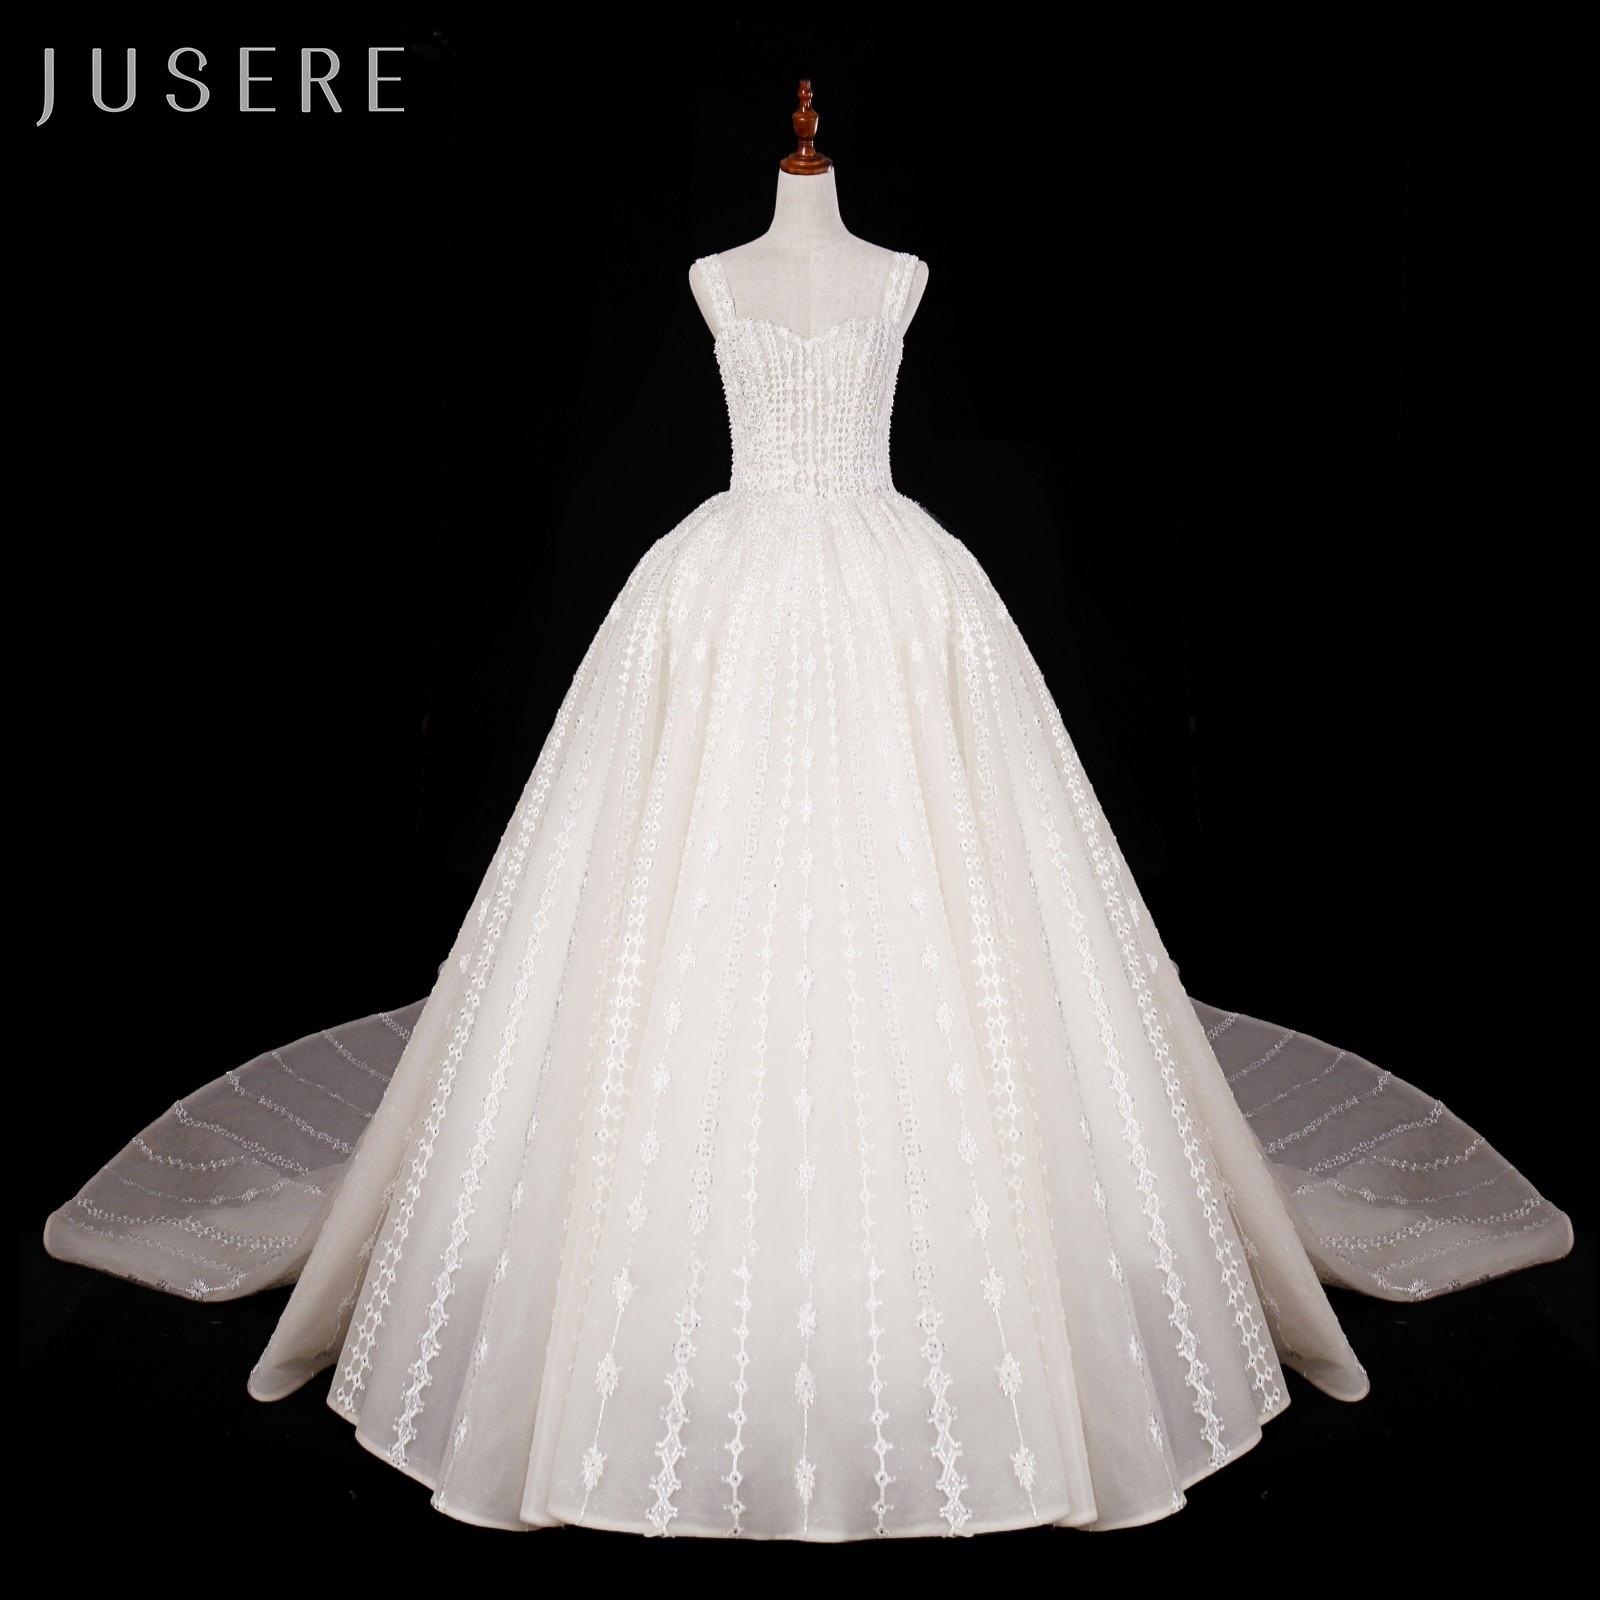 Luxury Cathedral Exquisite Dubai Wedding Dress Lebanese Crystal Wedding Dress with Big Train